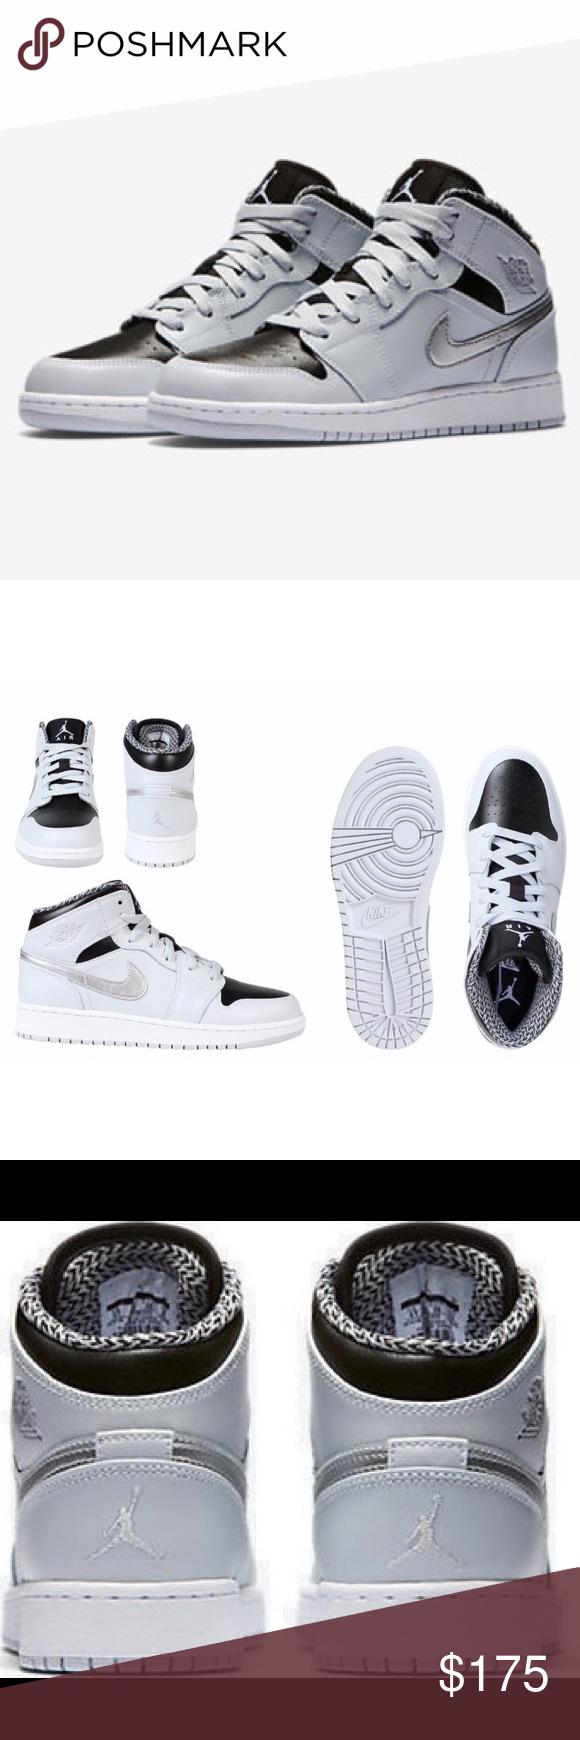 NIKE AIR JORDAN 1 WOMENS SIZE 8 METALLIC SHOES Shoes are a